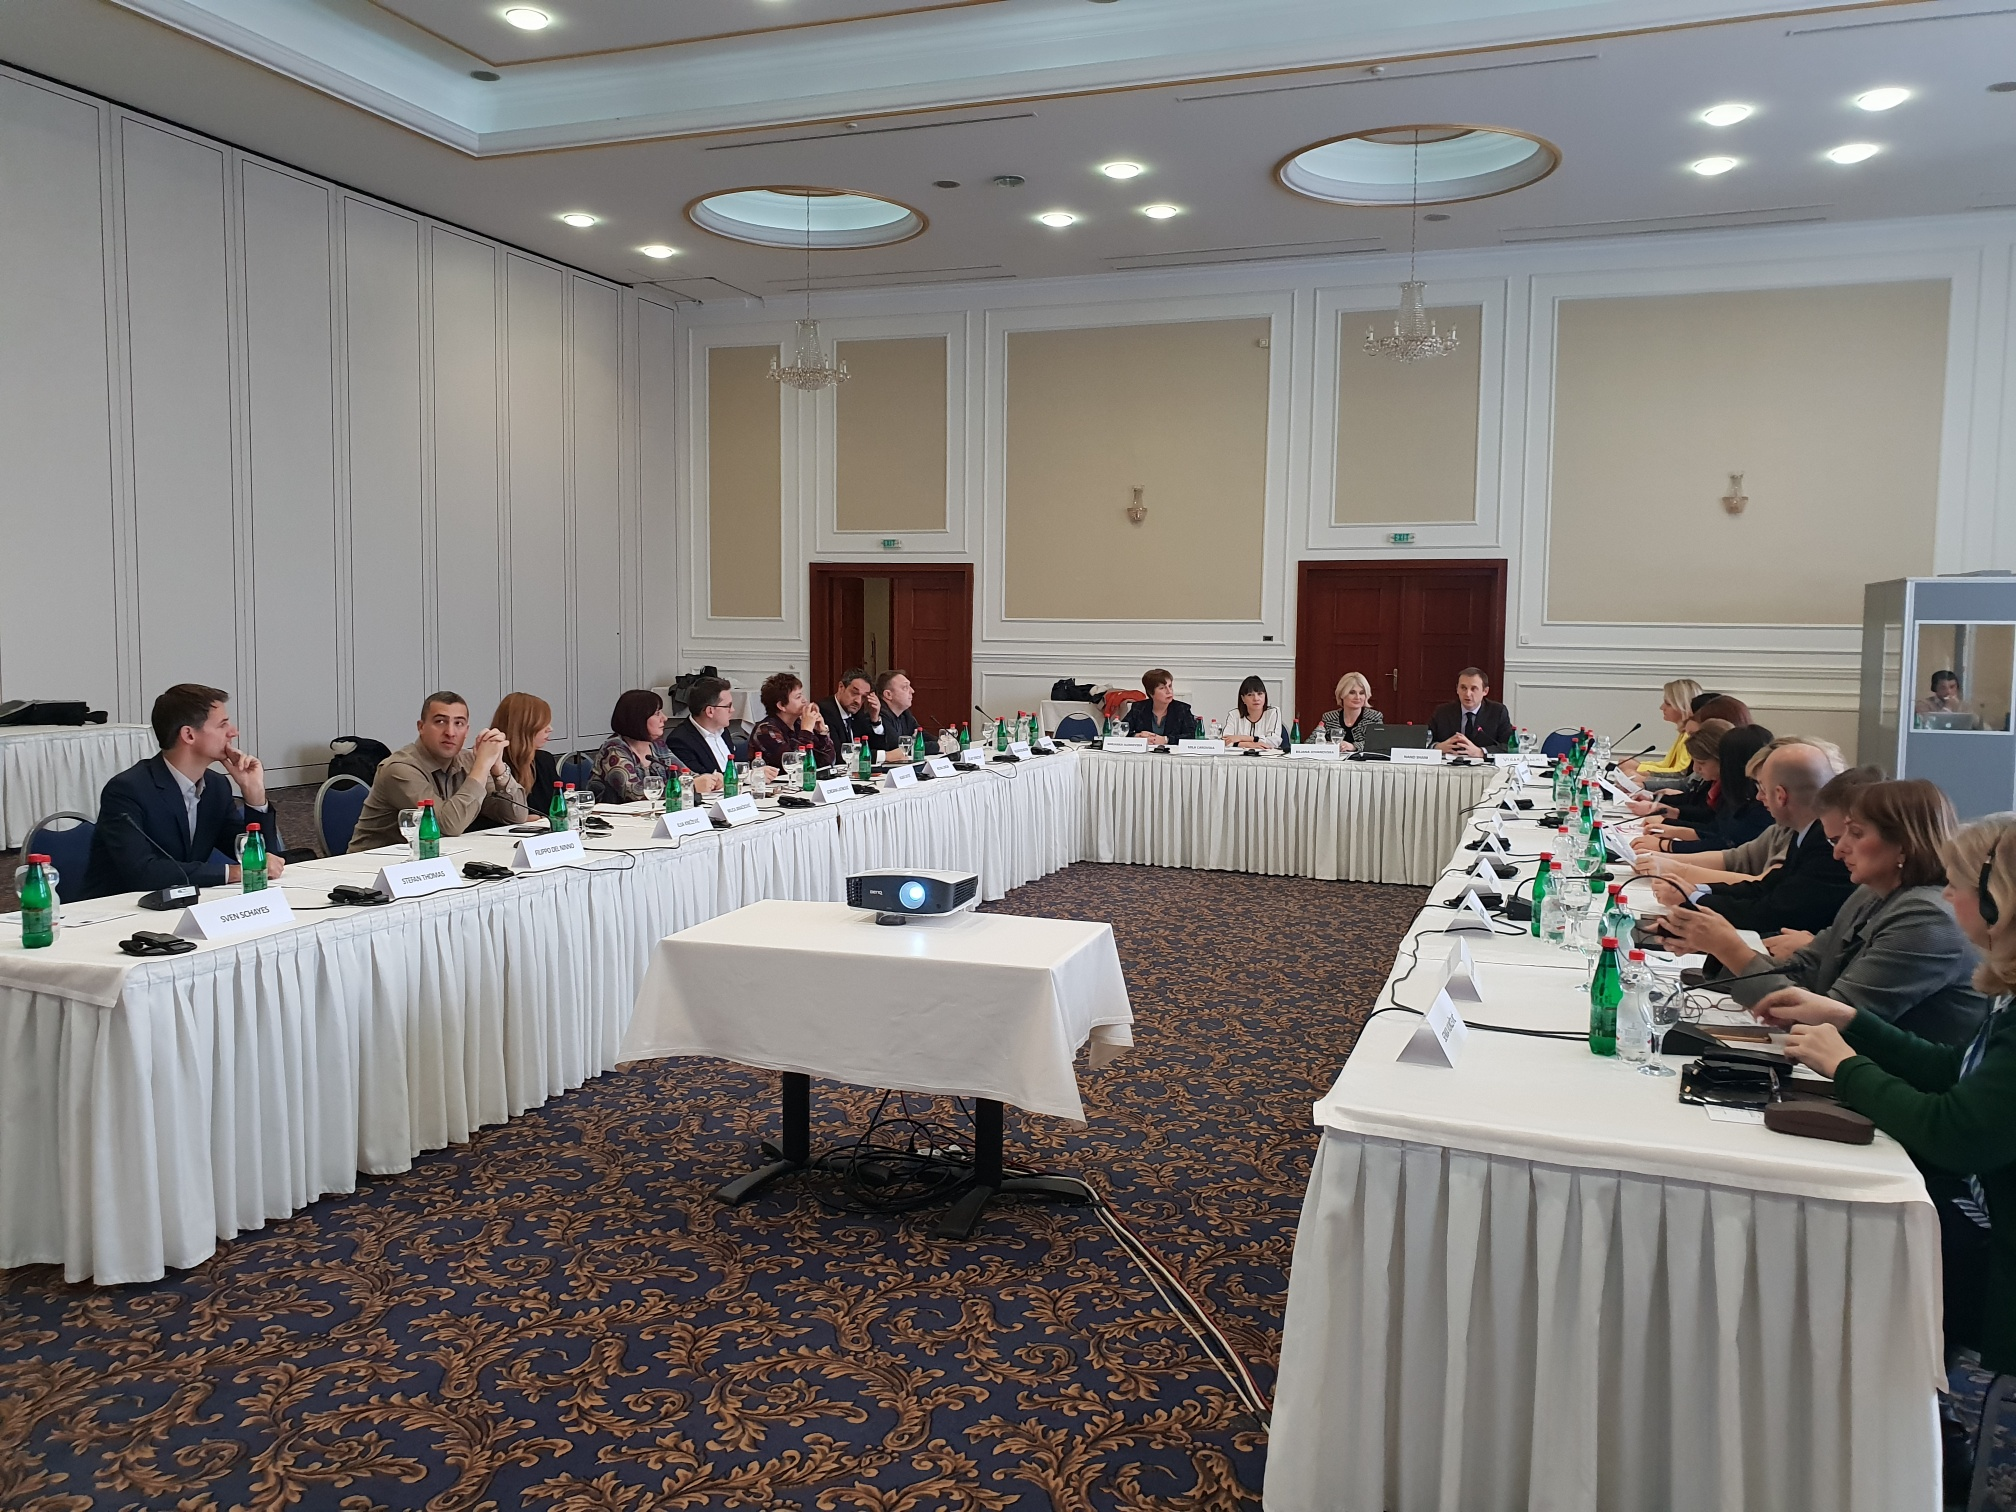 Regional peer review workshop focusing on internship programmes in Skopje 26-27 November 2018 (Photo: RCC/Sanda Topic)